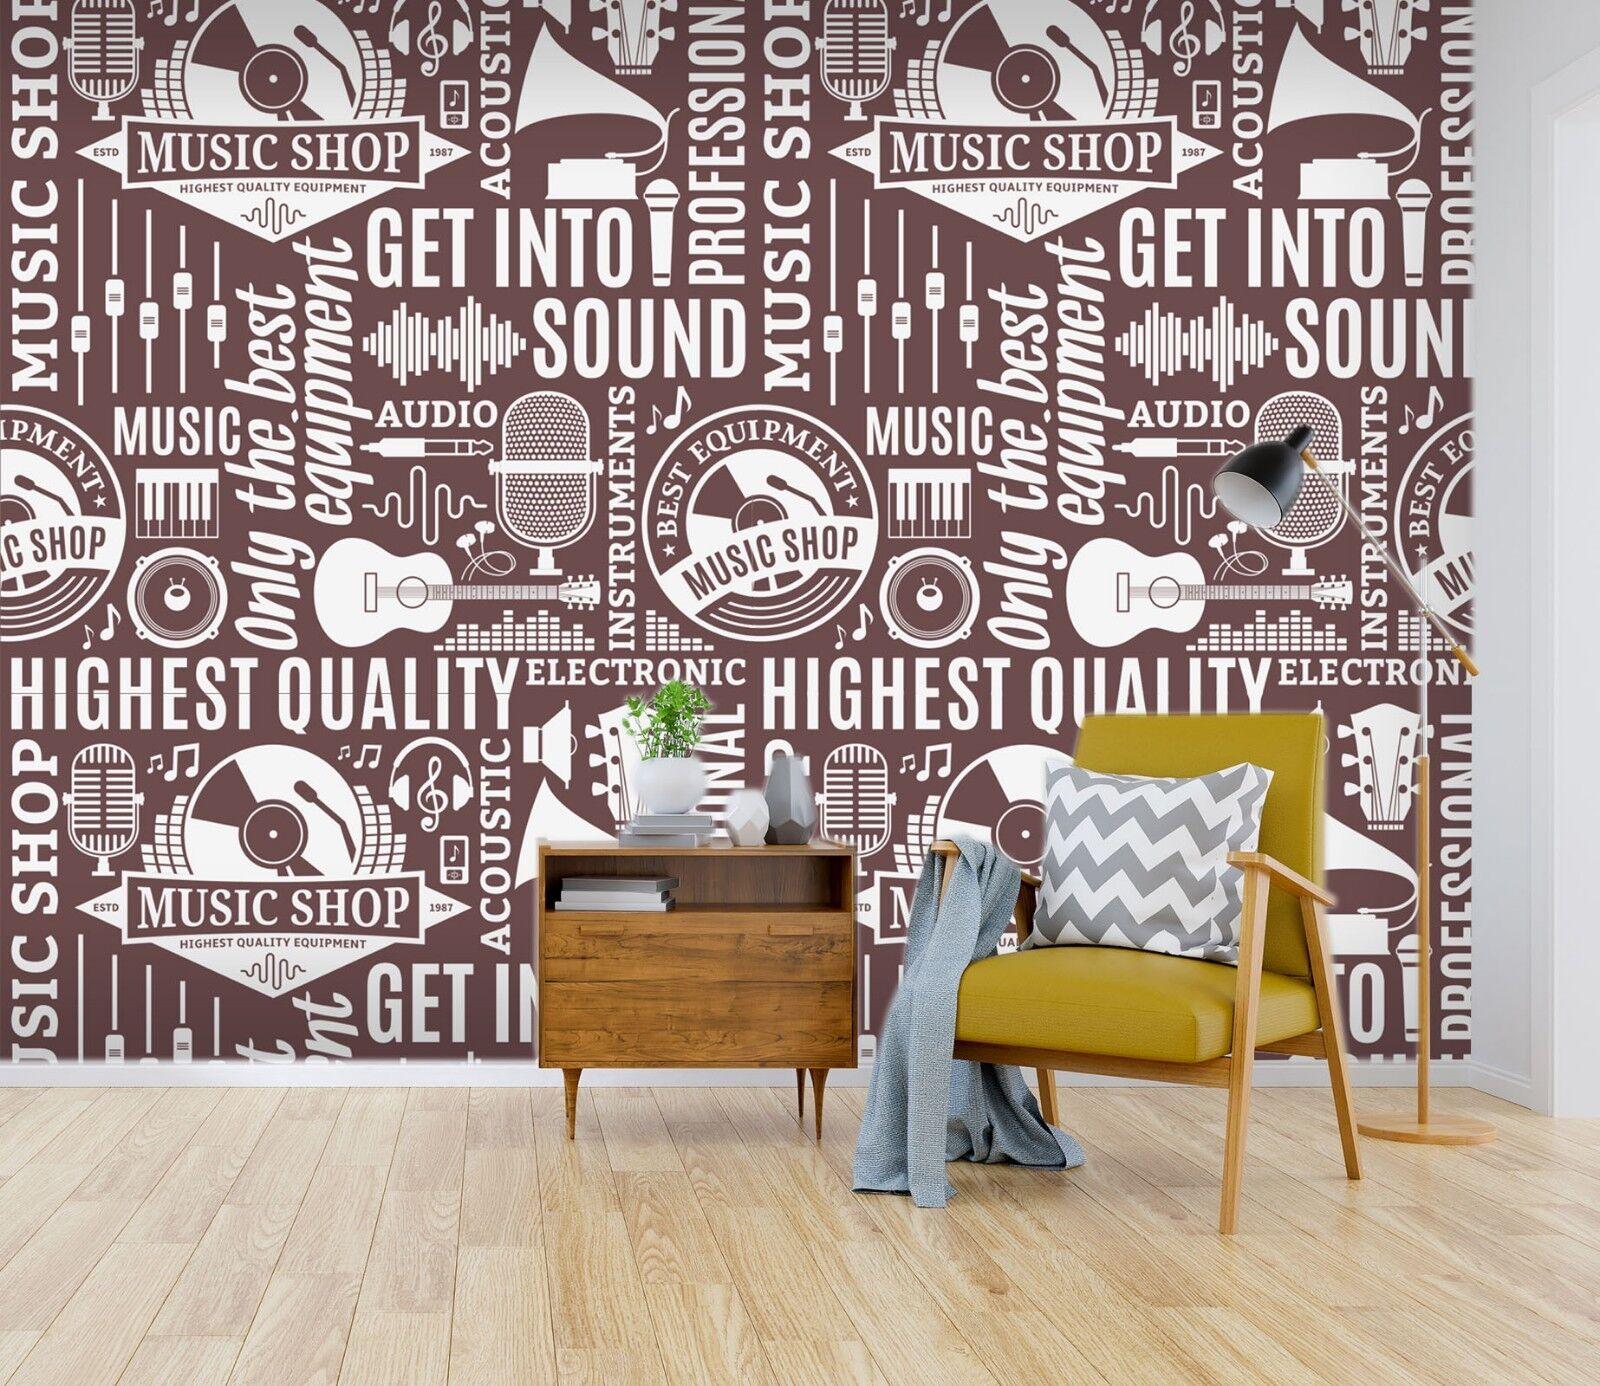 3D Guitar Pictorial 116 WallPaper Murals Wall Decal WallPaper AU Carly